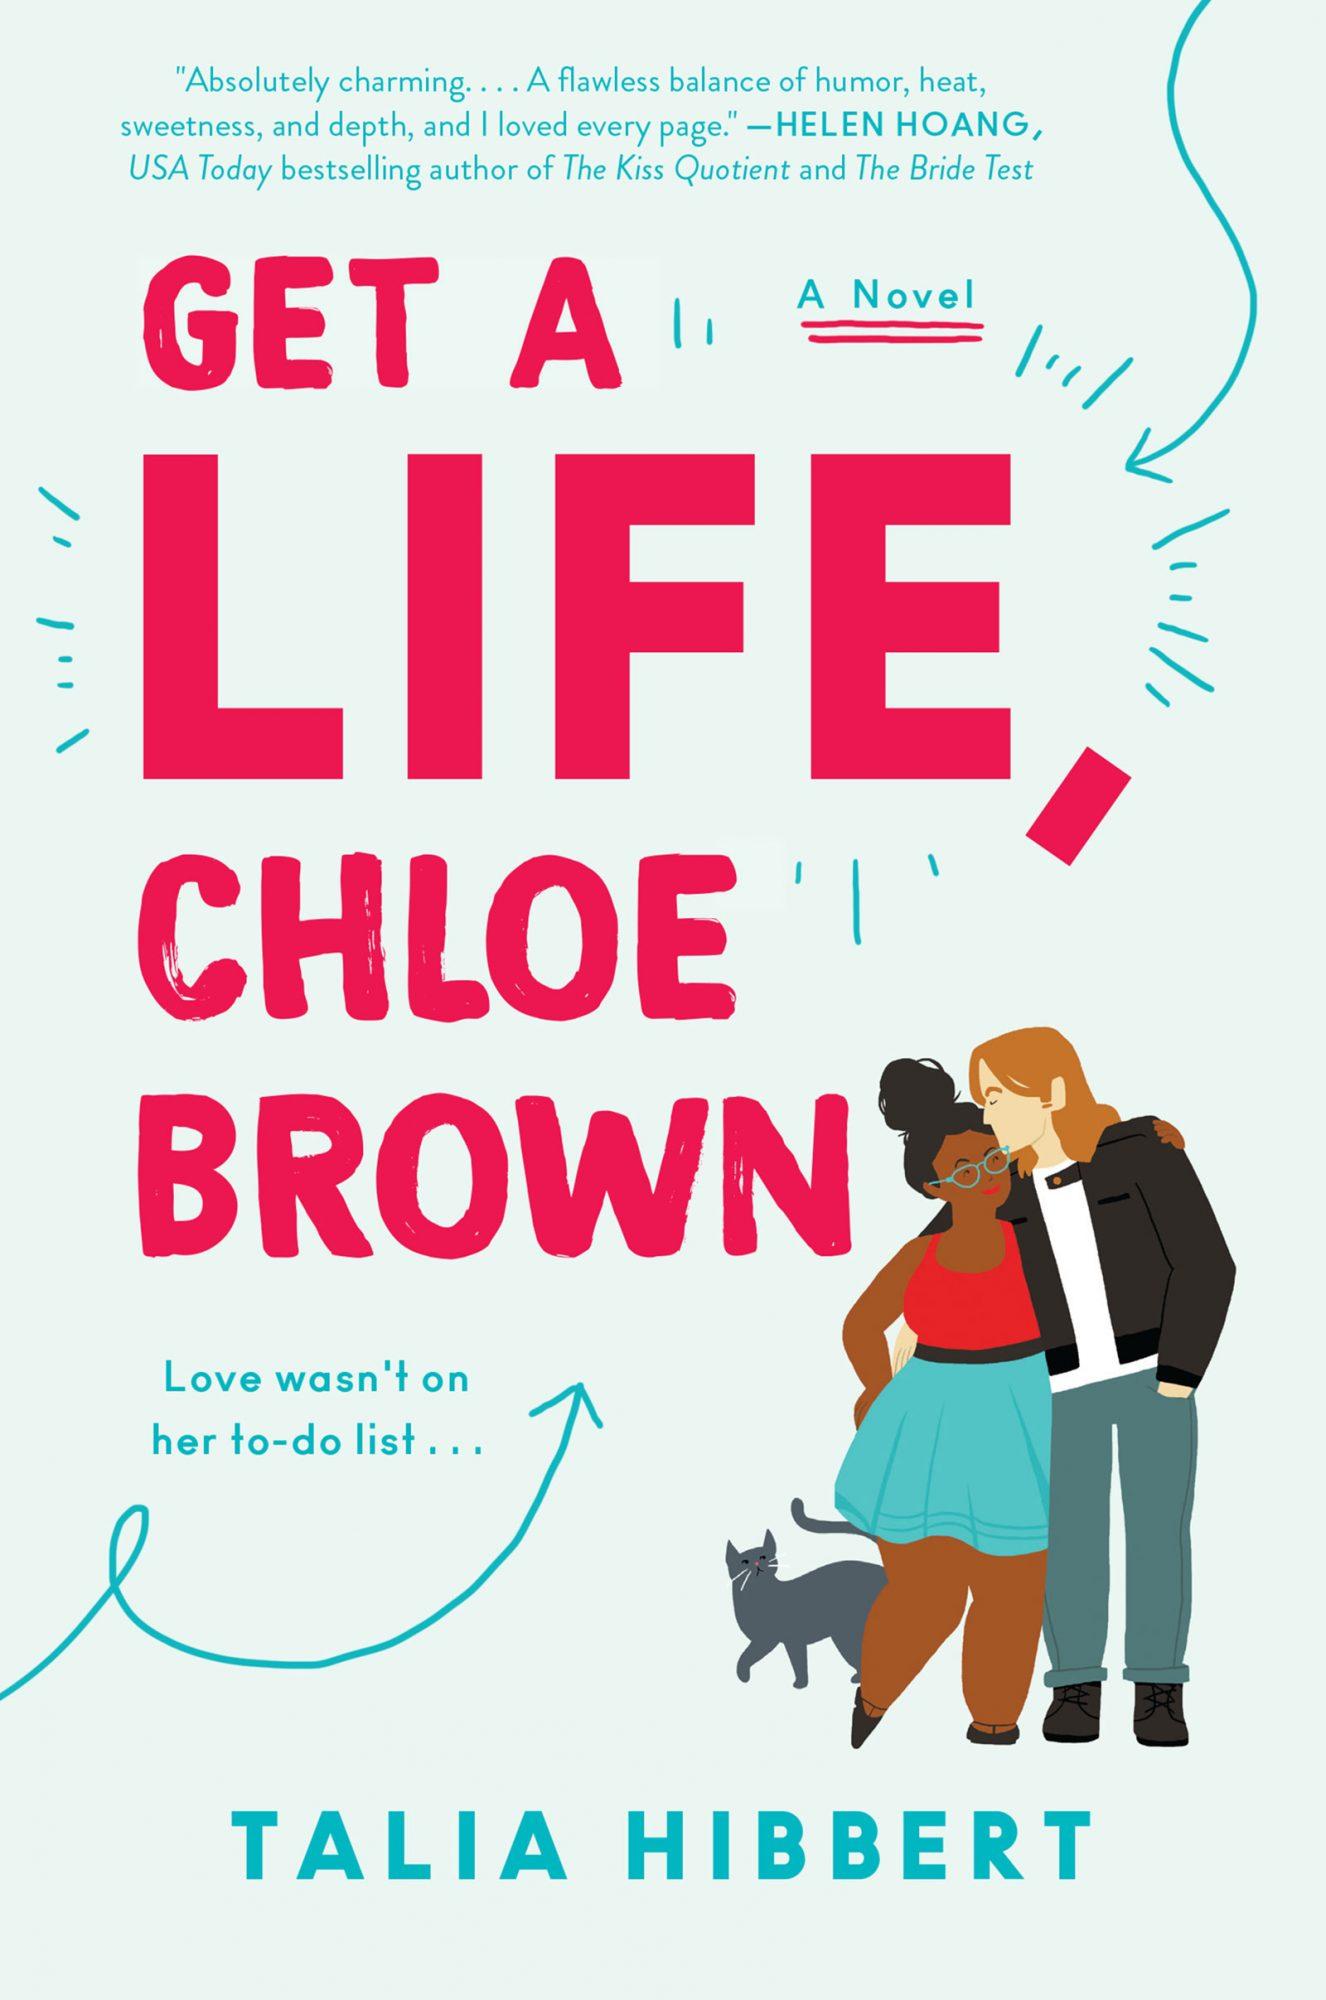 Get a Life, Chloe Brown by Talia Hibbert